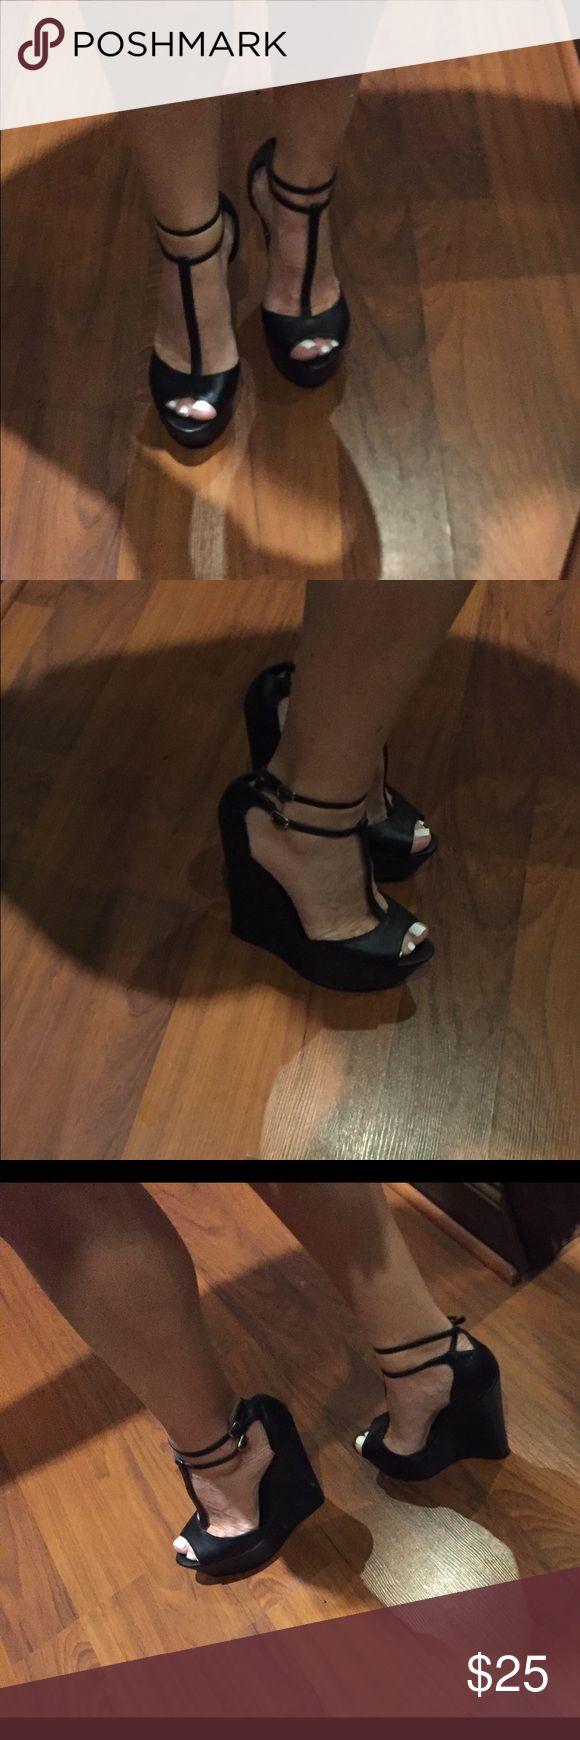 Steve madden T strap black wedges T strap black wedges size 6.5 Steve Madden Shoes Wedges